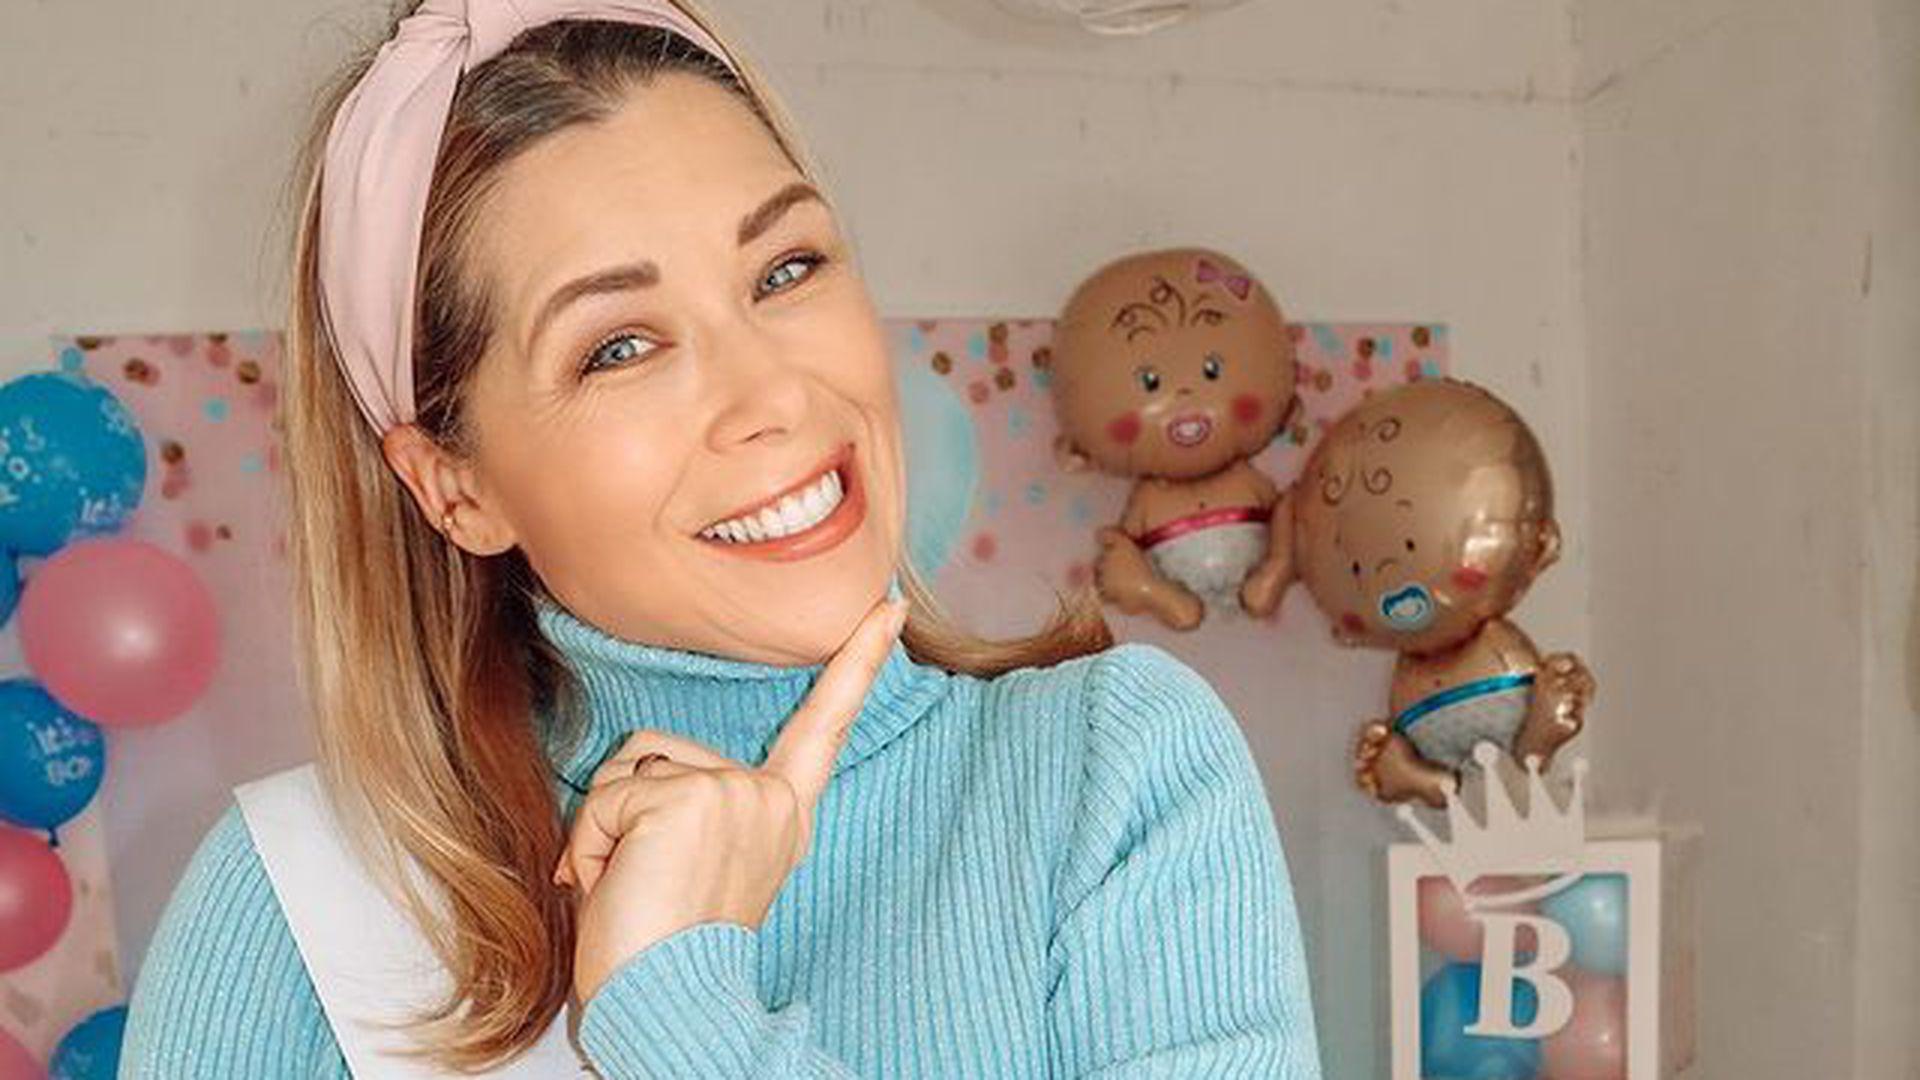 Endlich: Schwangere Tanja Szewczenko verrät Babygeschlecht! - Promiflash.de